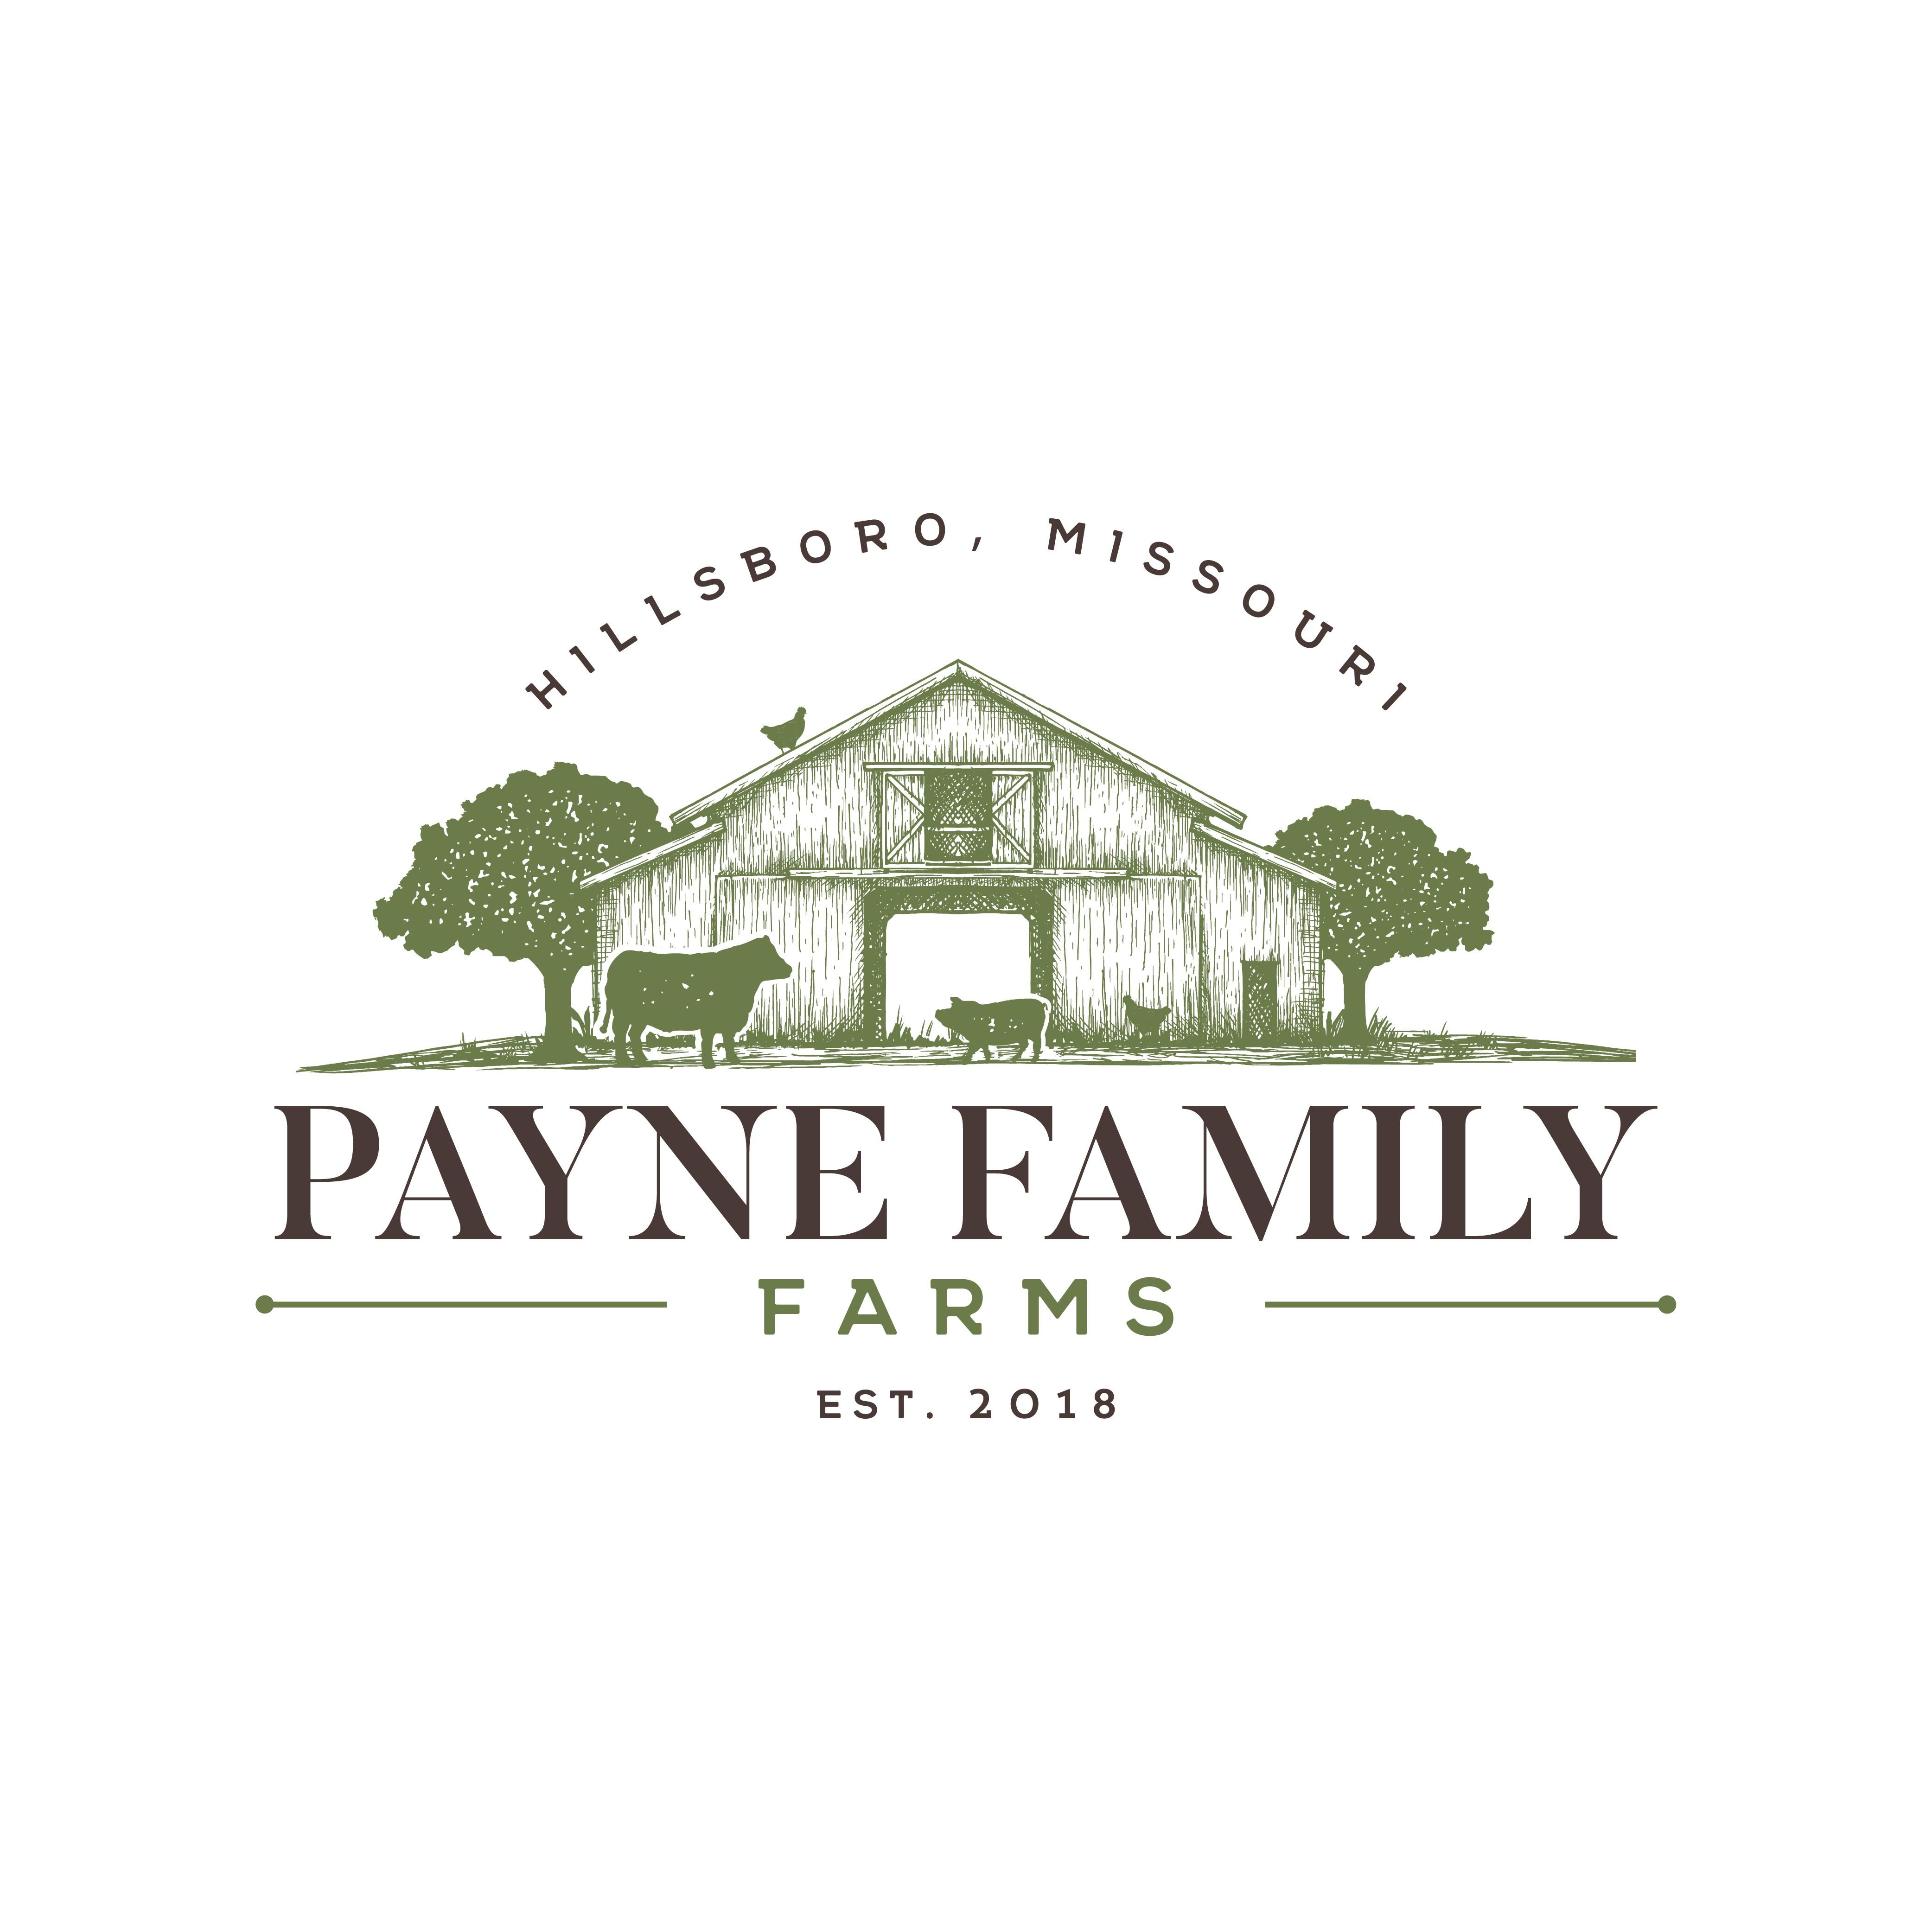 Fresh/New Age Logo for Payne Family Farms